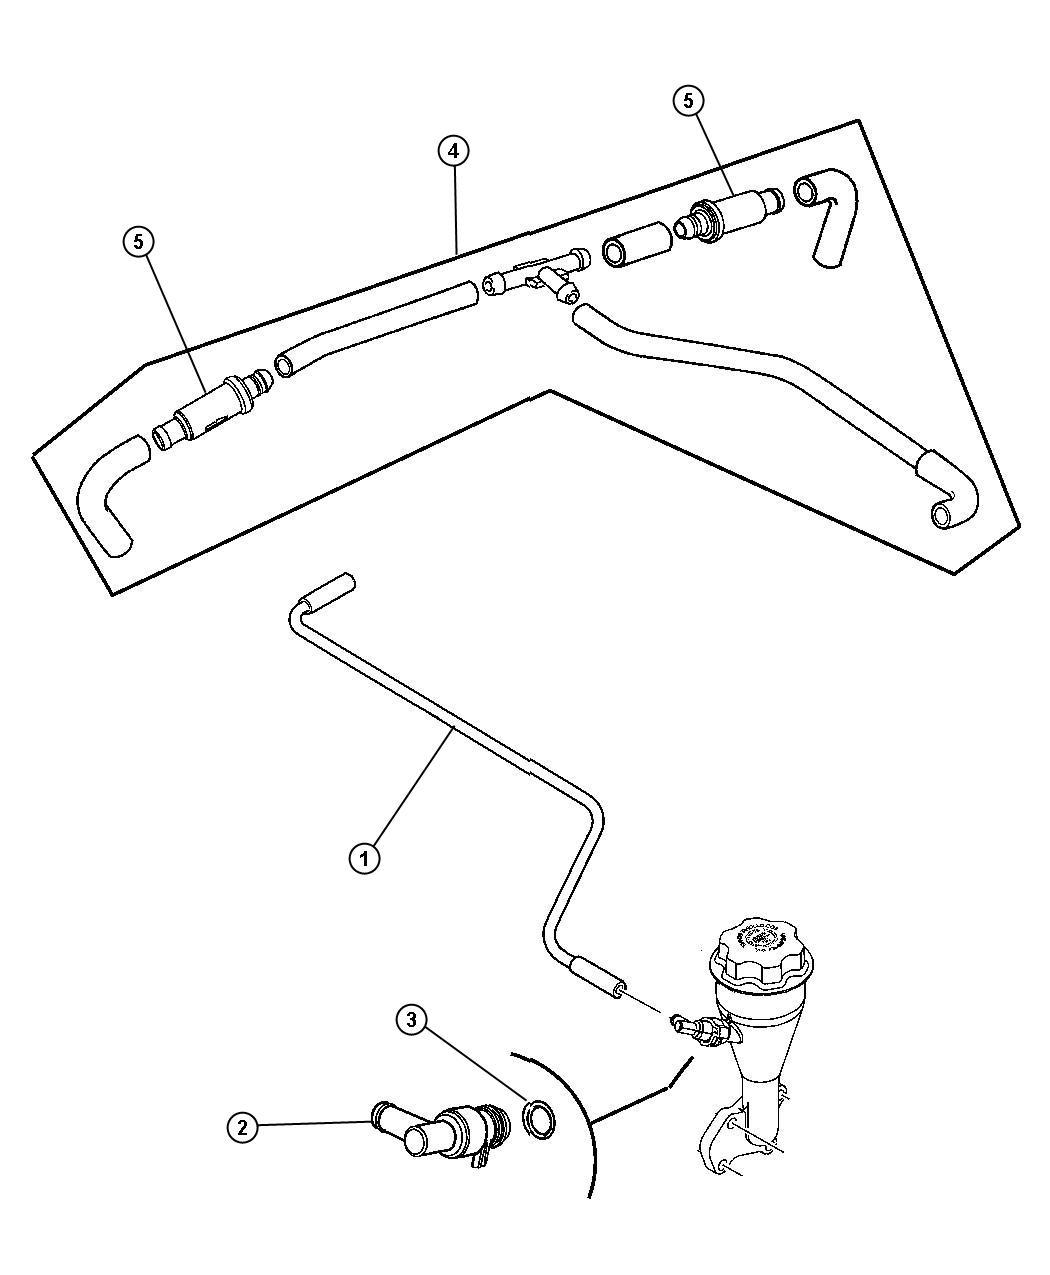 Jeep Grand Cherokee Vacuum Hose Diagram : grand, cherokee, vacuum, diagram, Disconnection, Garage, Forum